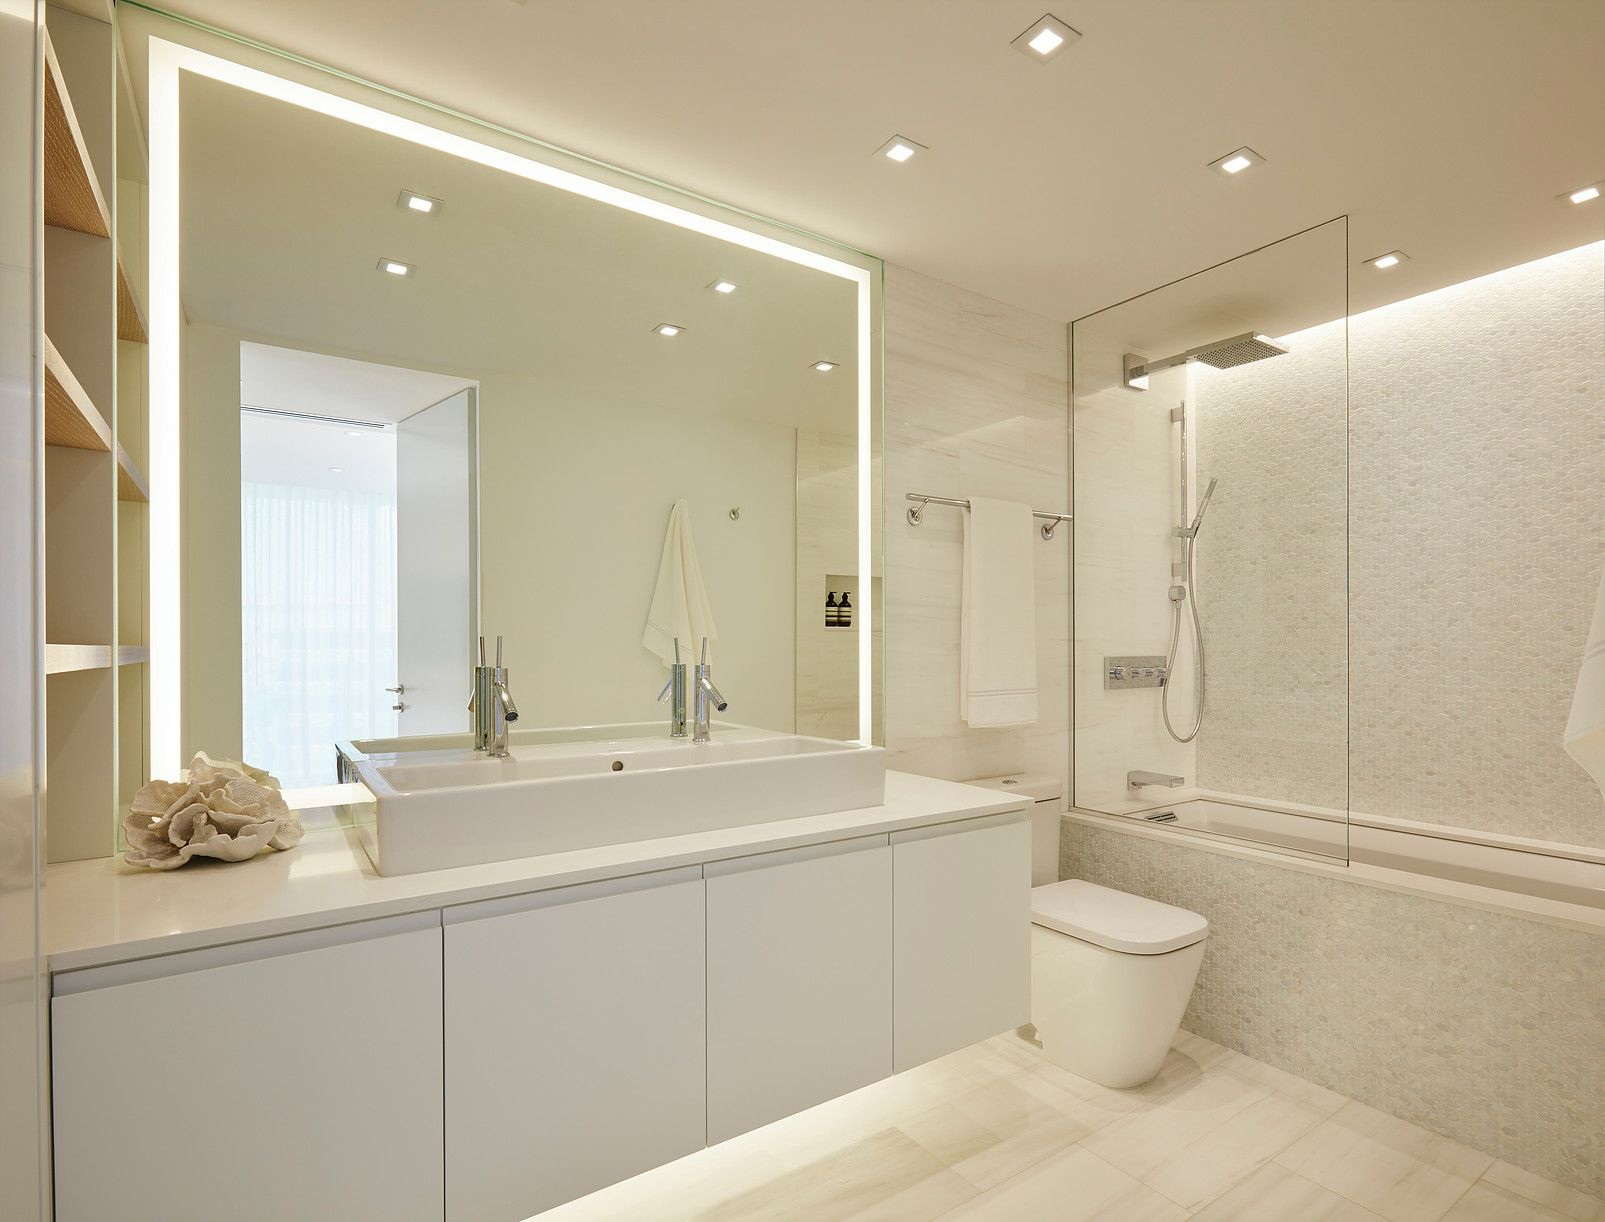 Fullservice Interior Design Firm in Miami FL styling bathrooms